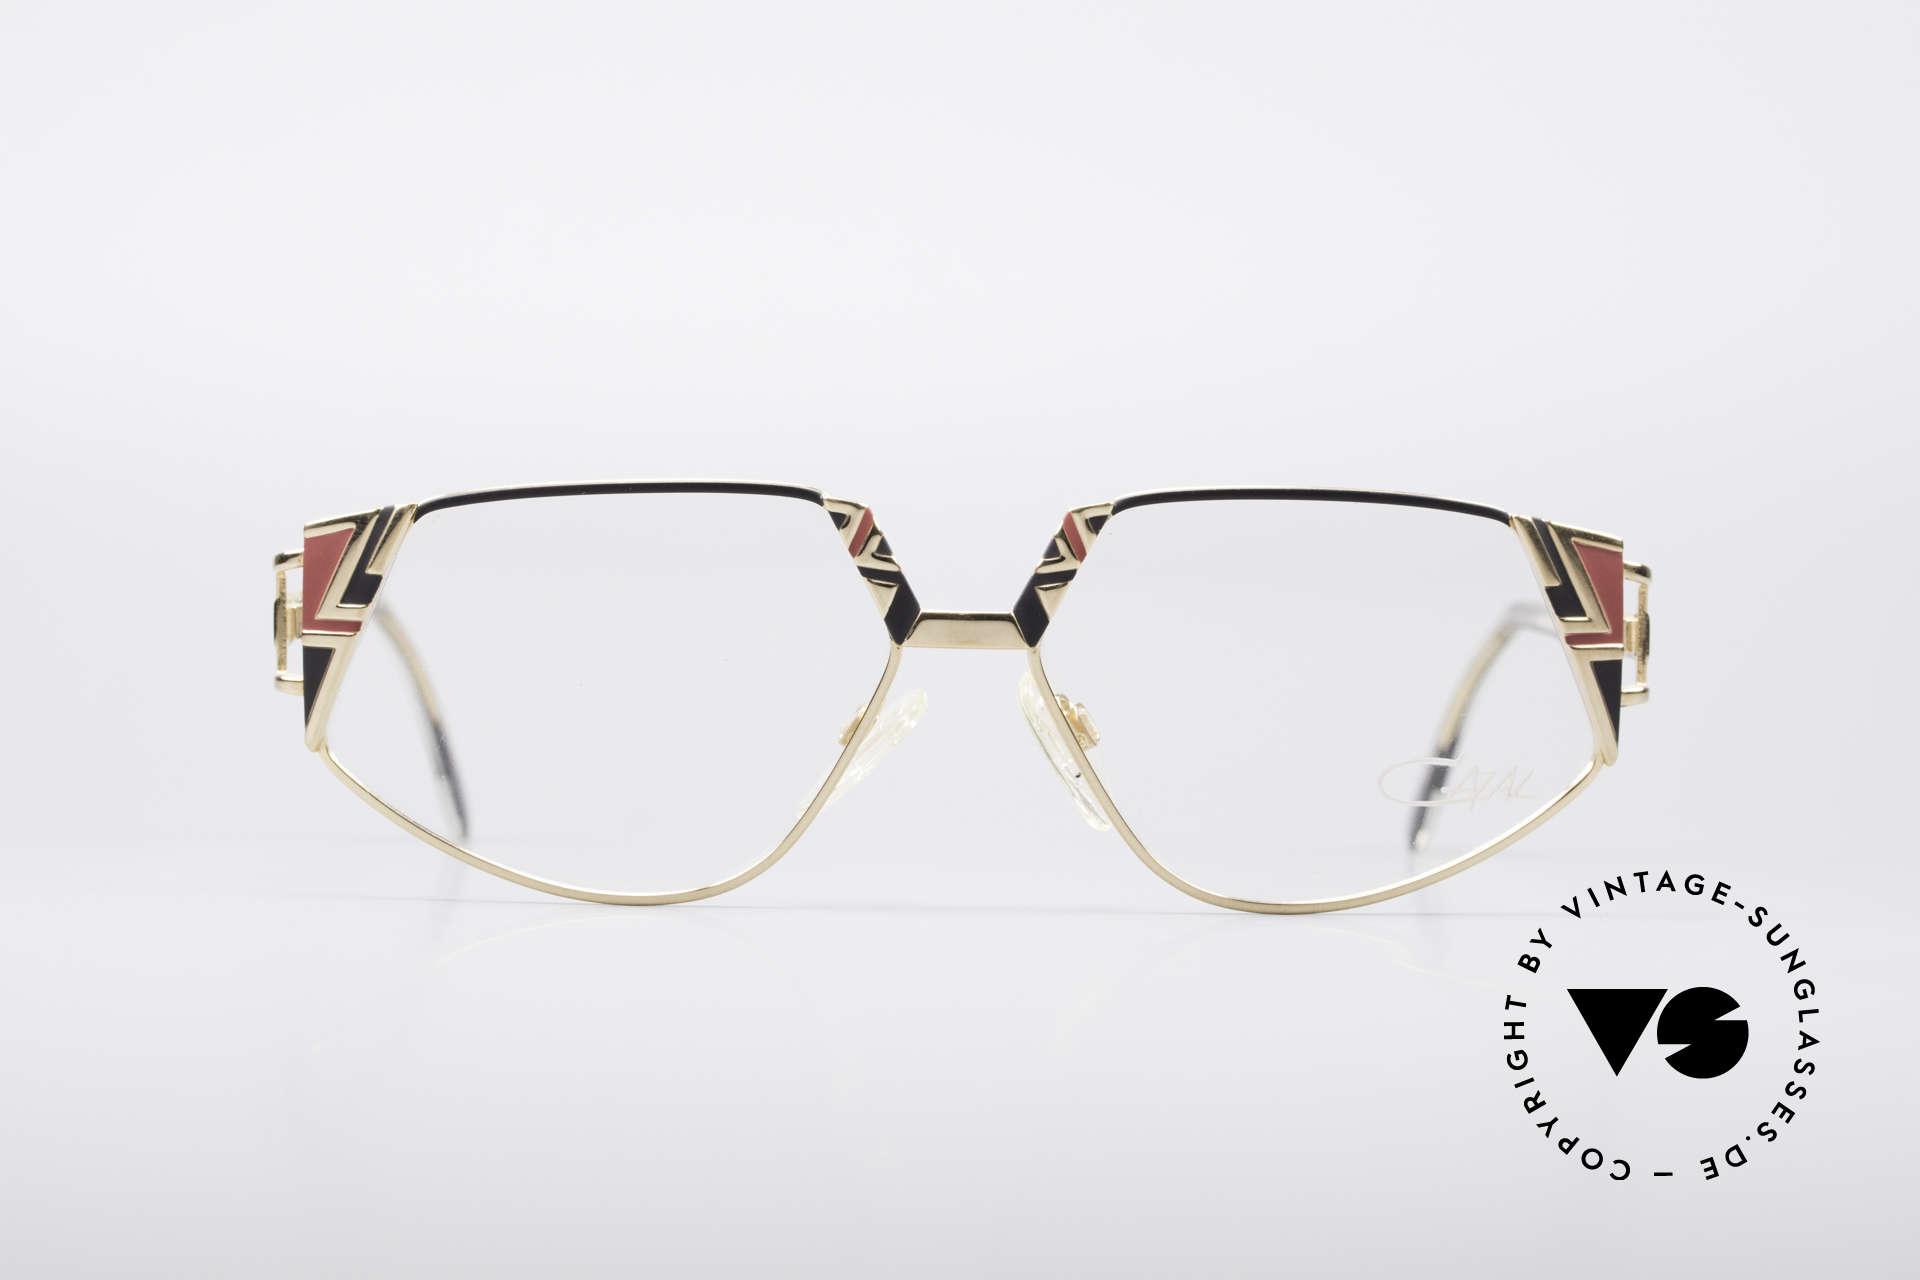 Cazal 238 Cateye Vintage Glasses, designer eyeglasses by famous CAri ZALloni (CAZAL), Made for Women